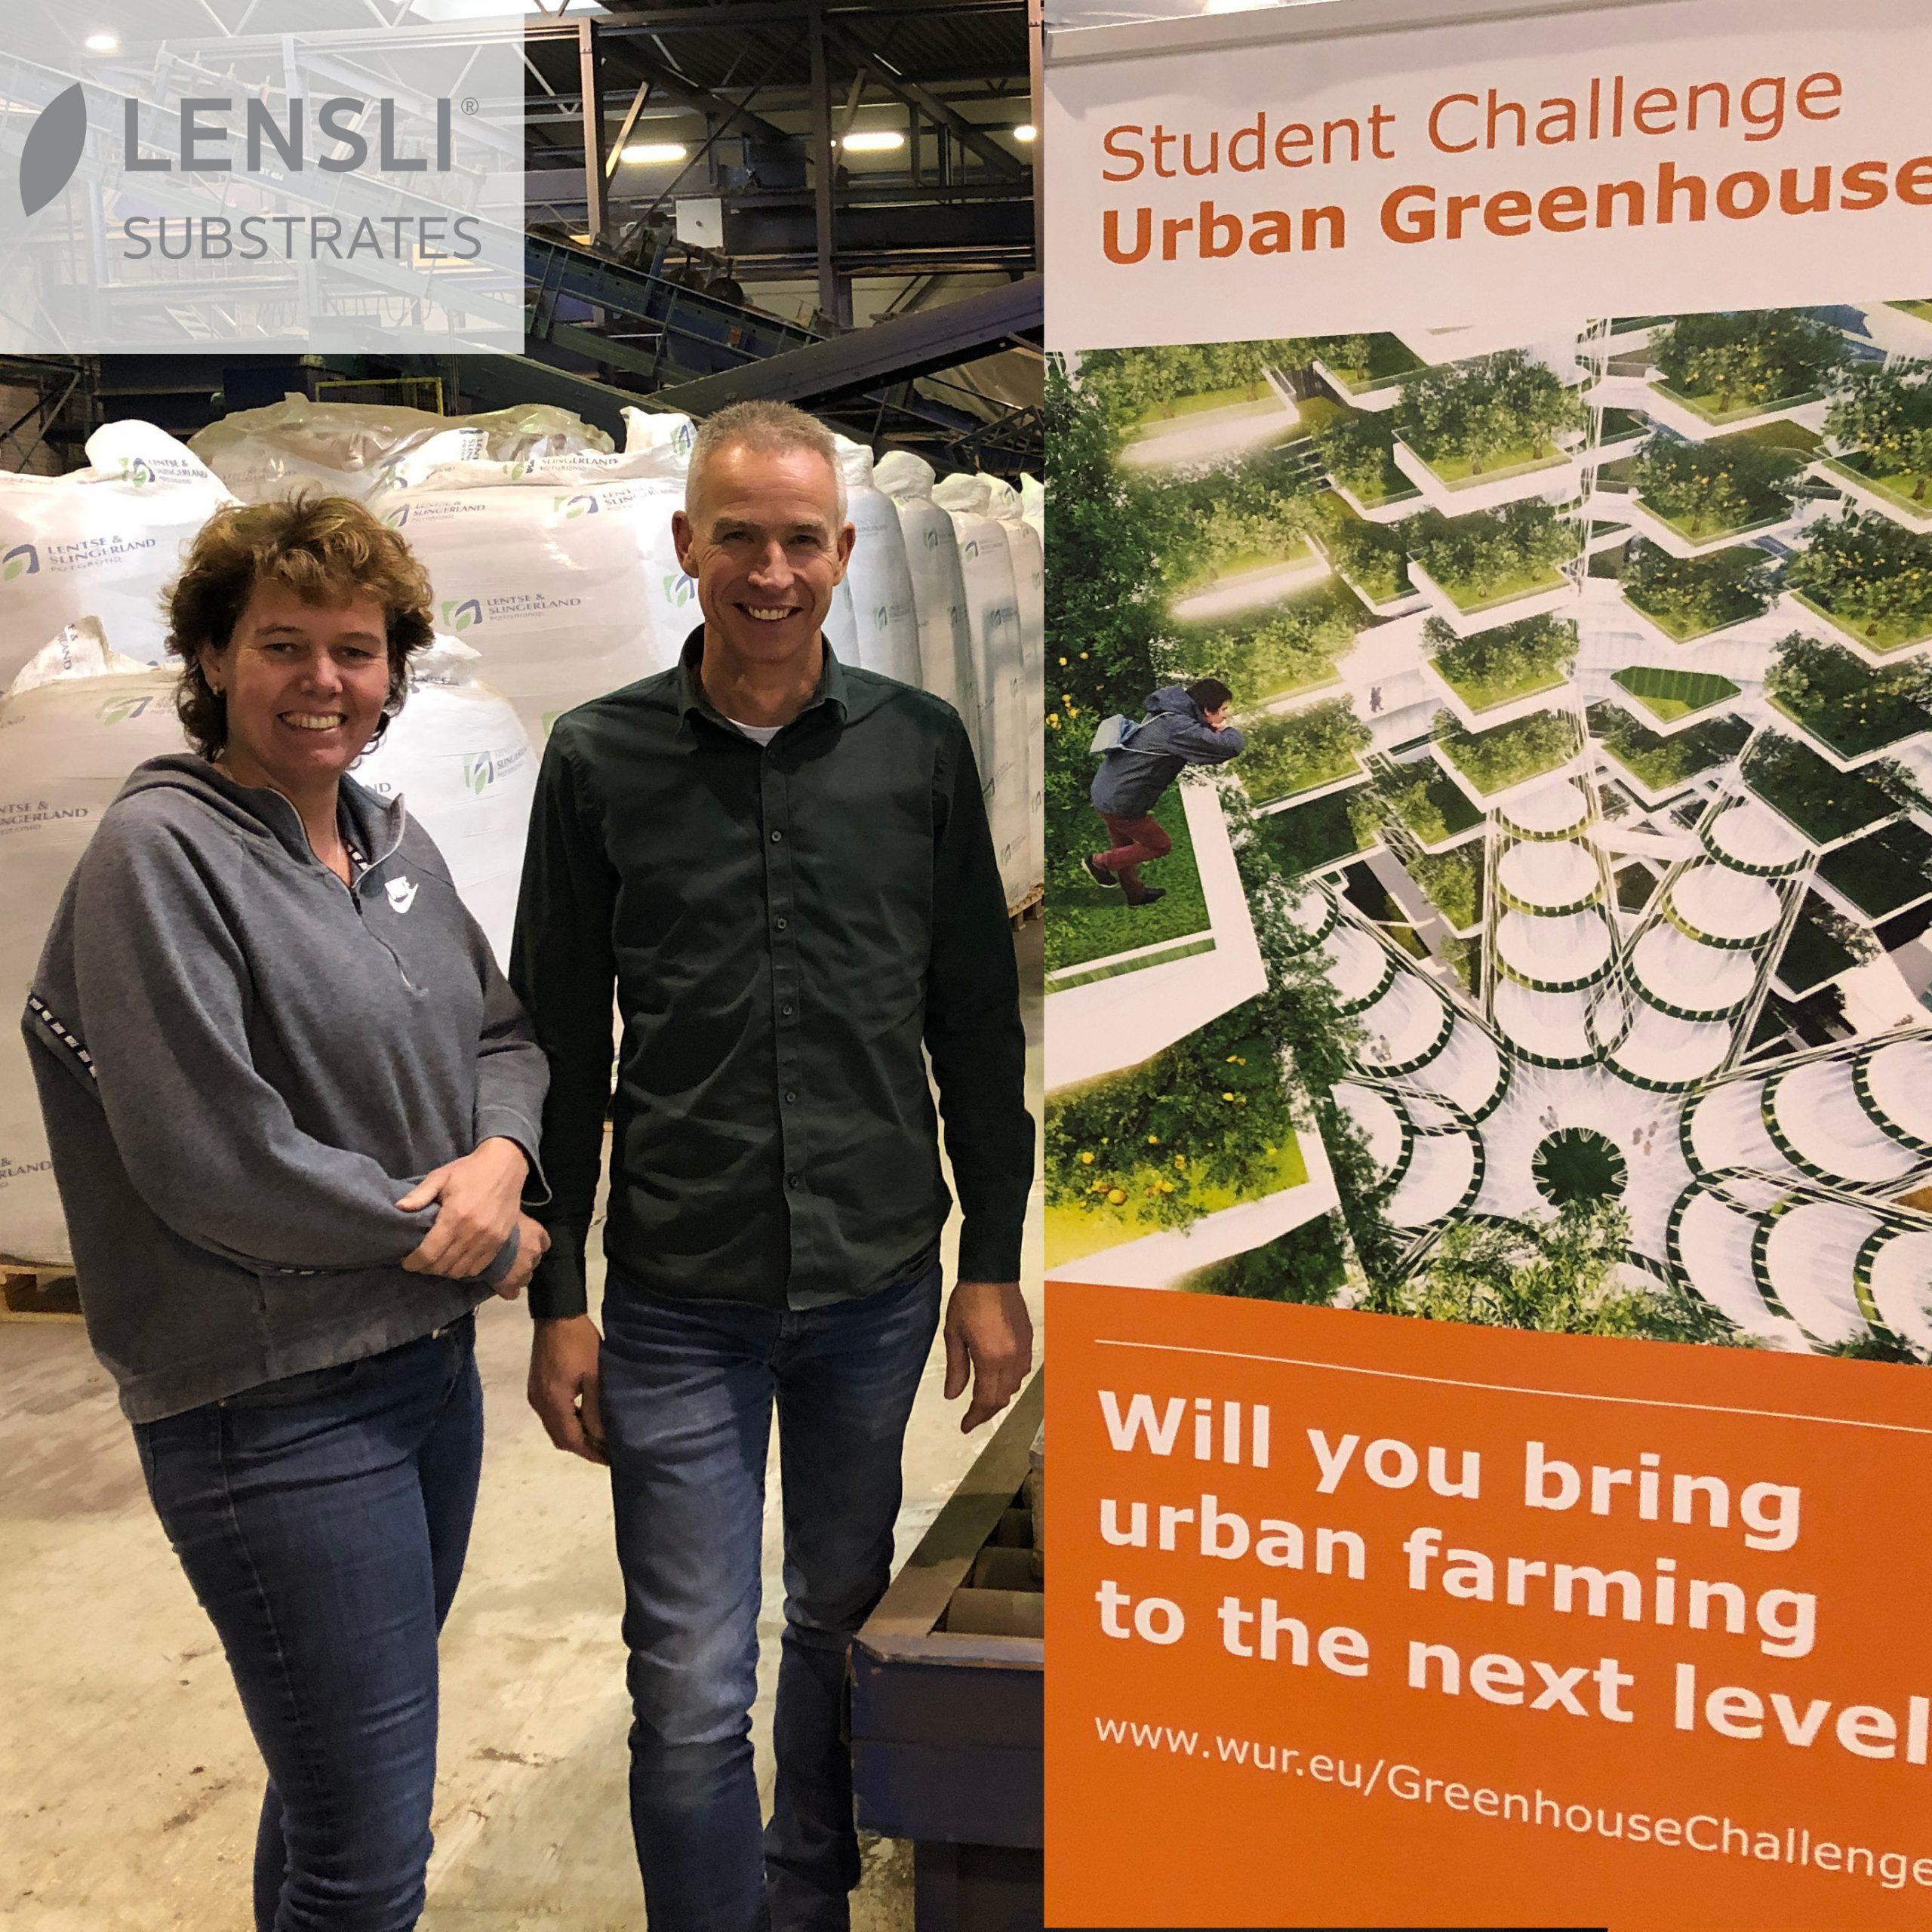 Lensli coacht WUR Urban Greenhouse Challenge